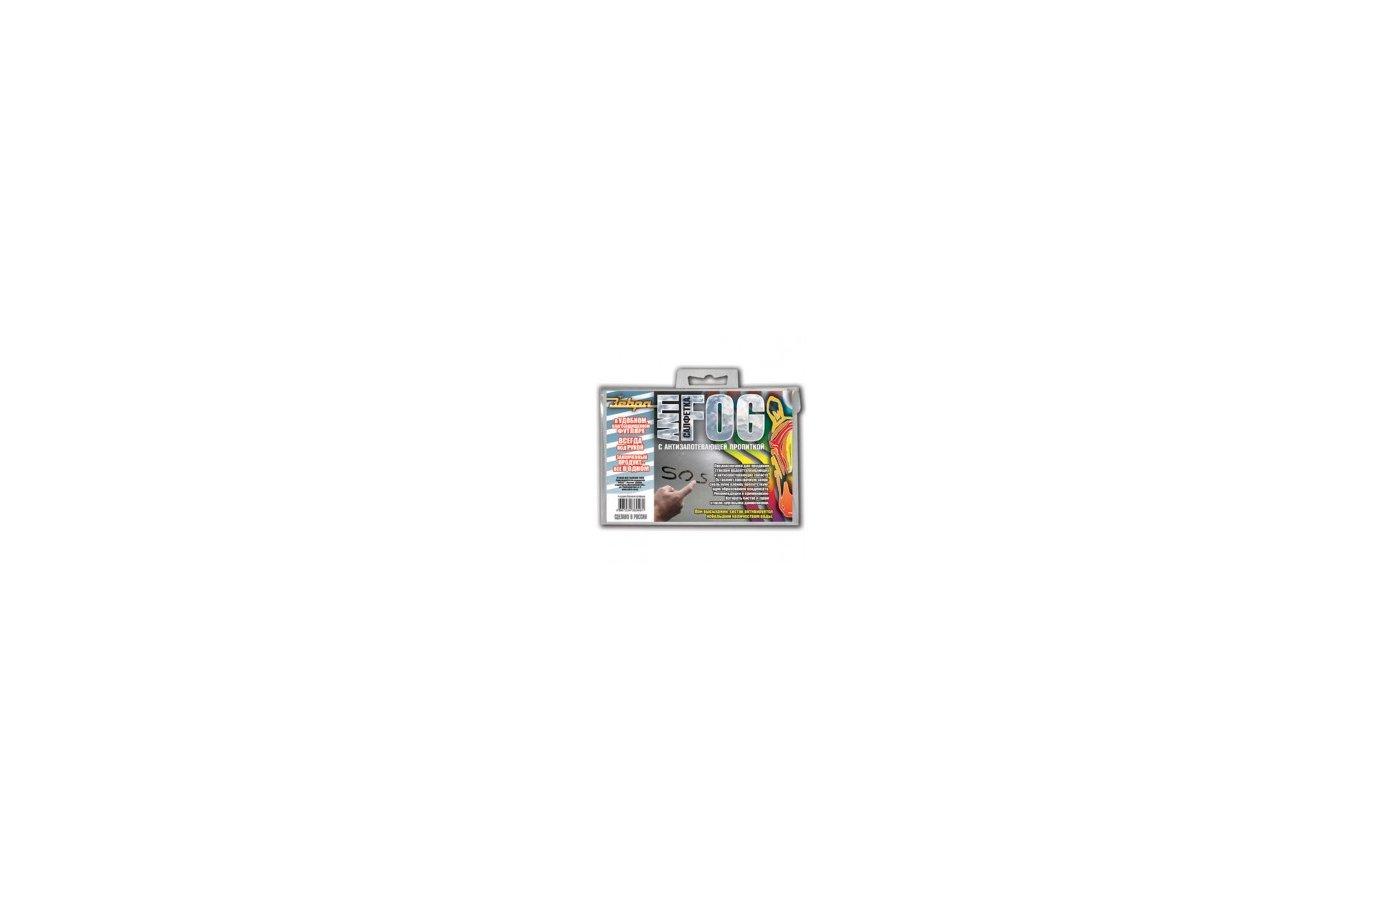 Автохимия ЗЕБРА ТМ 0481 Антизапотевающая салфетка